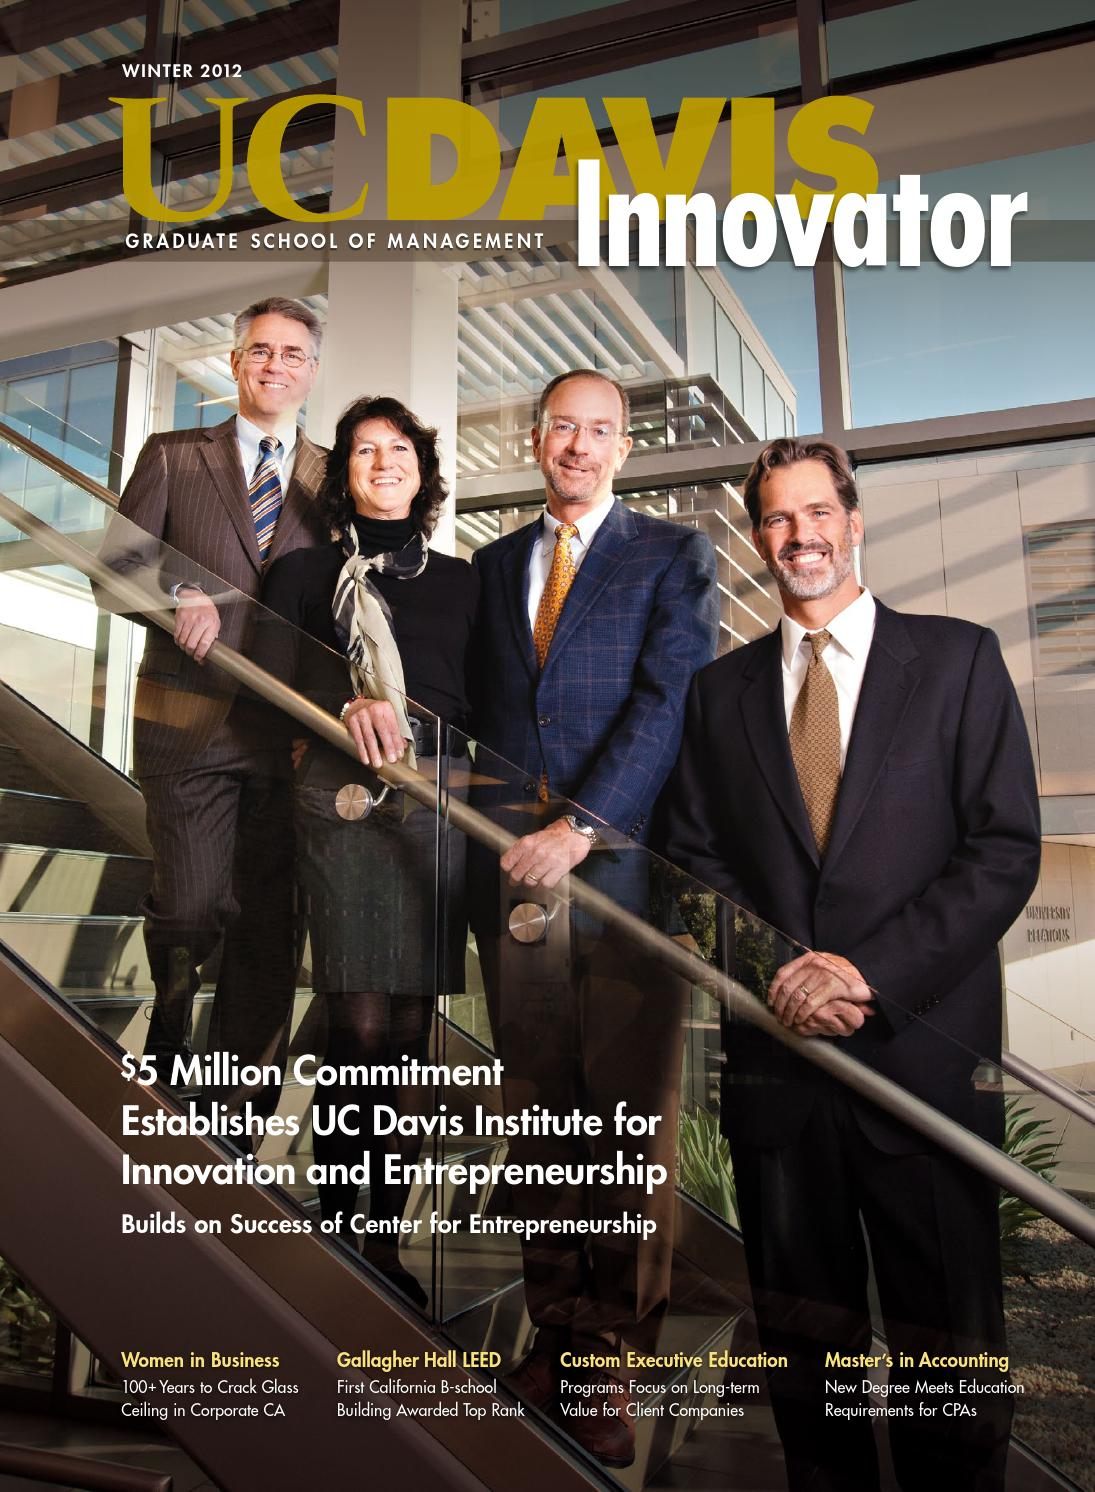 2012 innovator by uc davis graduate school of management issuu